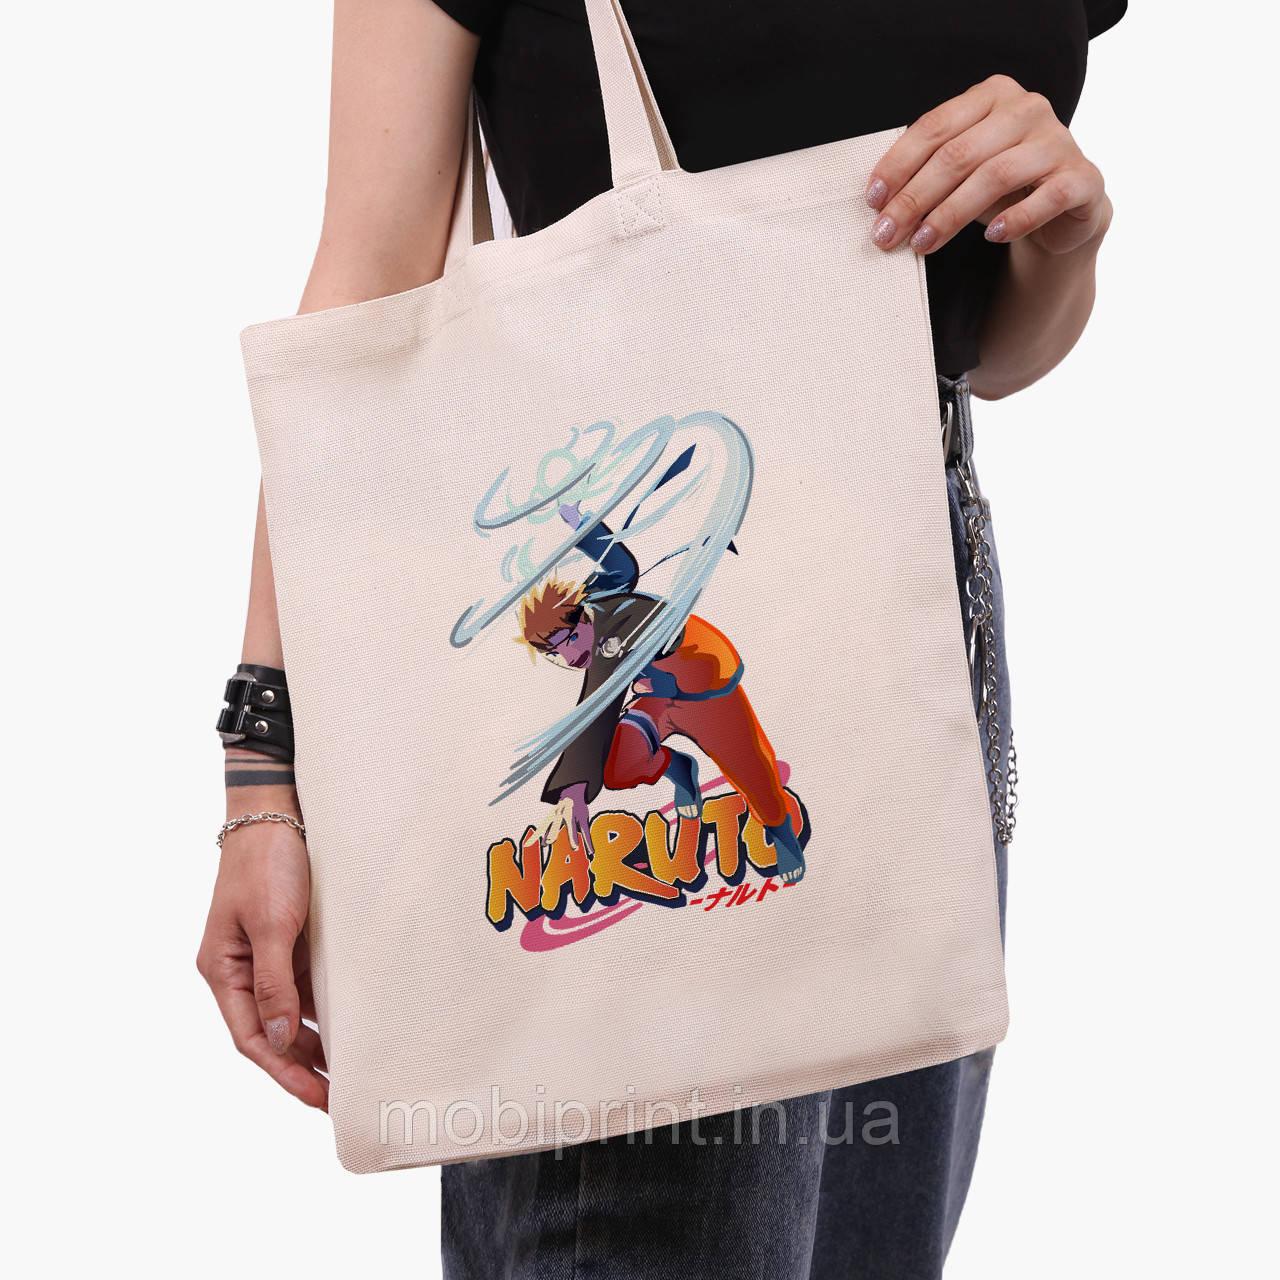 Еко сумка шоппер Наруто Узумакі (Naruto Uzumaki) (9227-2814) 41*35 см